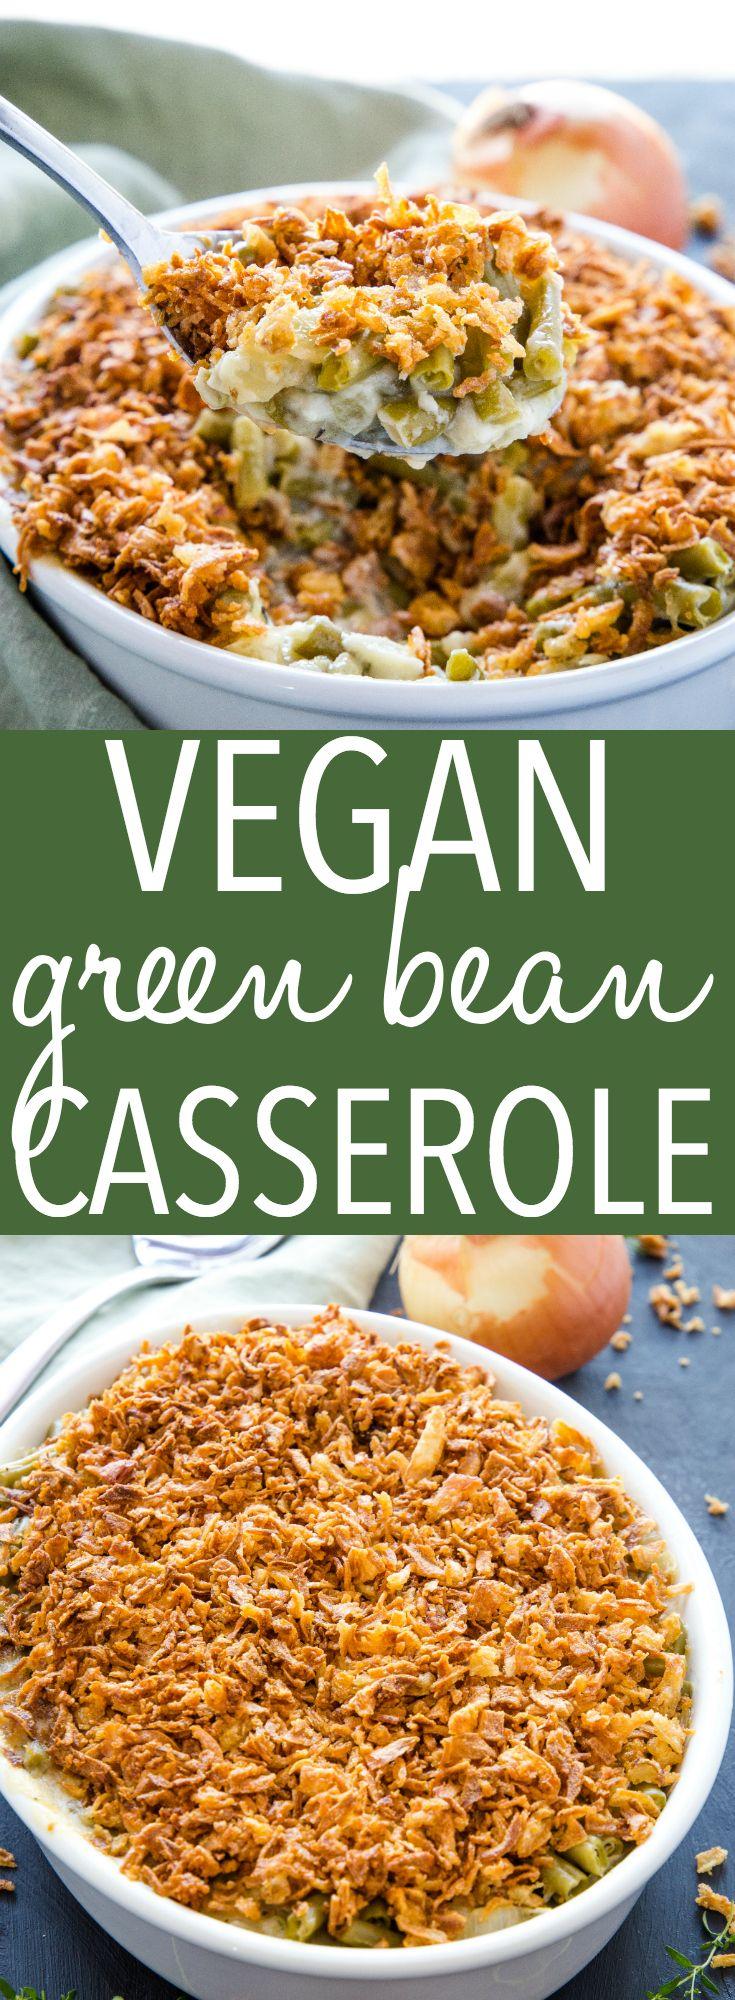 Easy Vegan Green Bean Casserole images